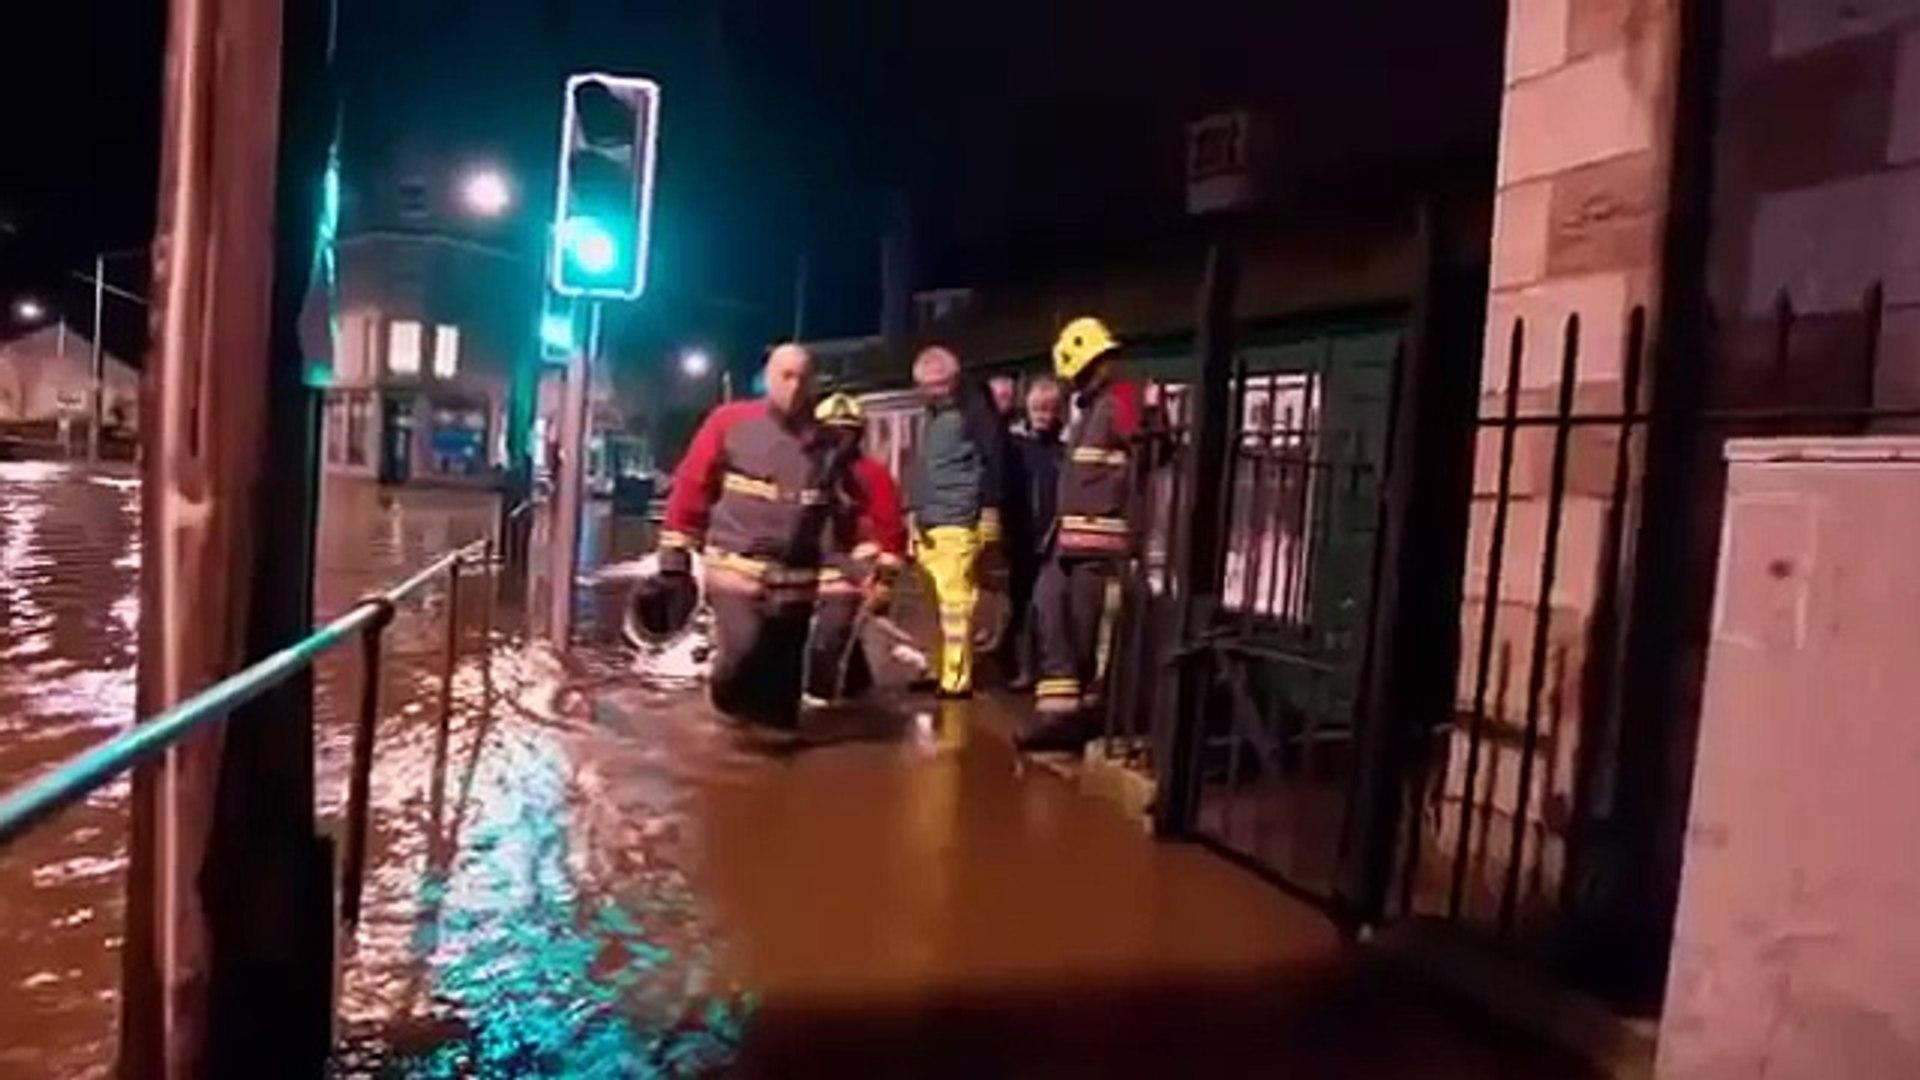 England Floods in UK - Flooding in England November 2012 - UK Flood